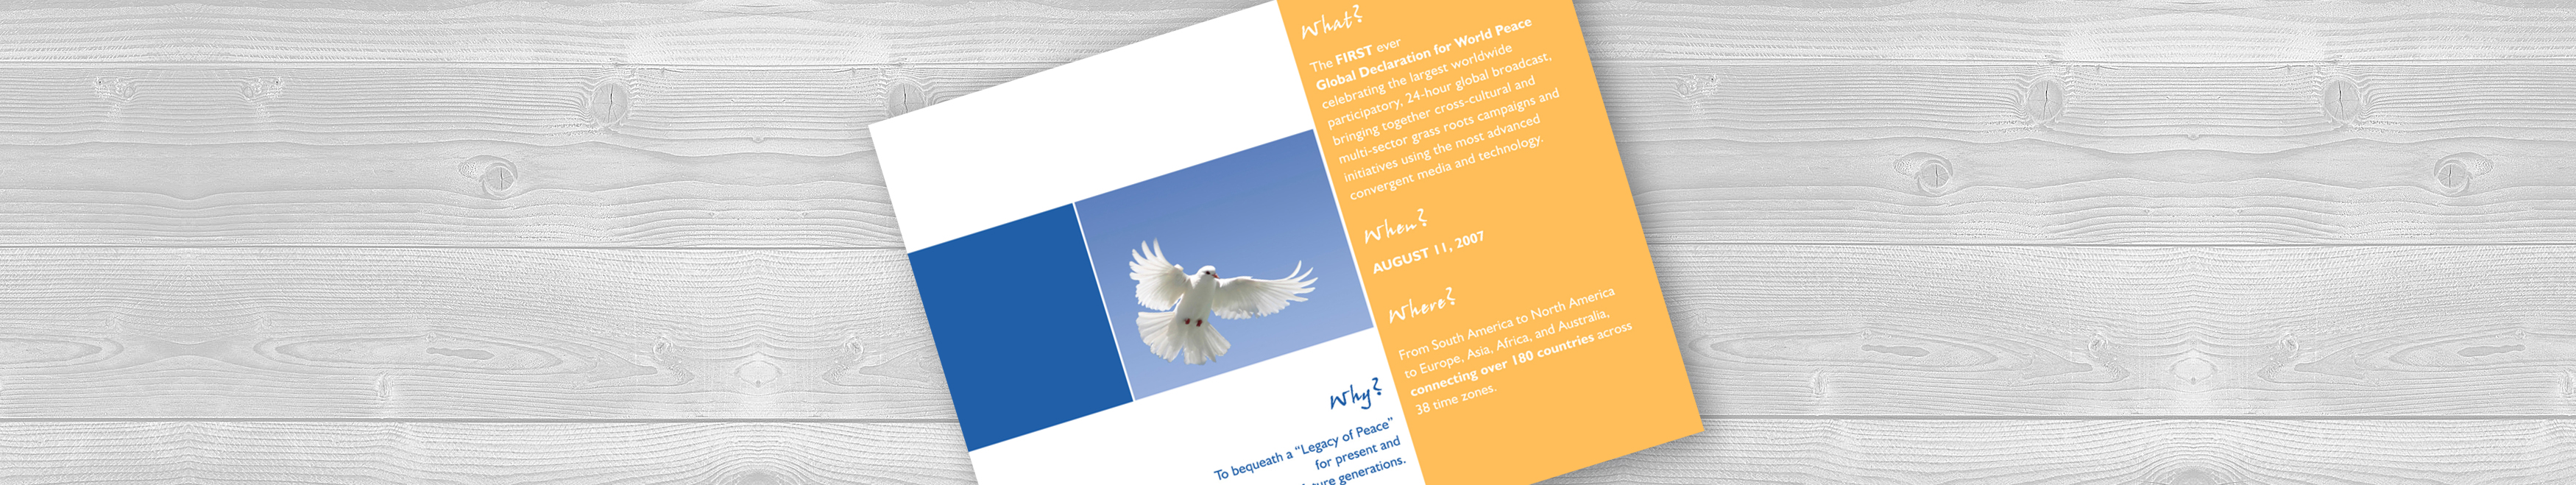 Press Kit Public Event Insite Media Design